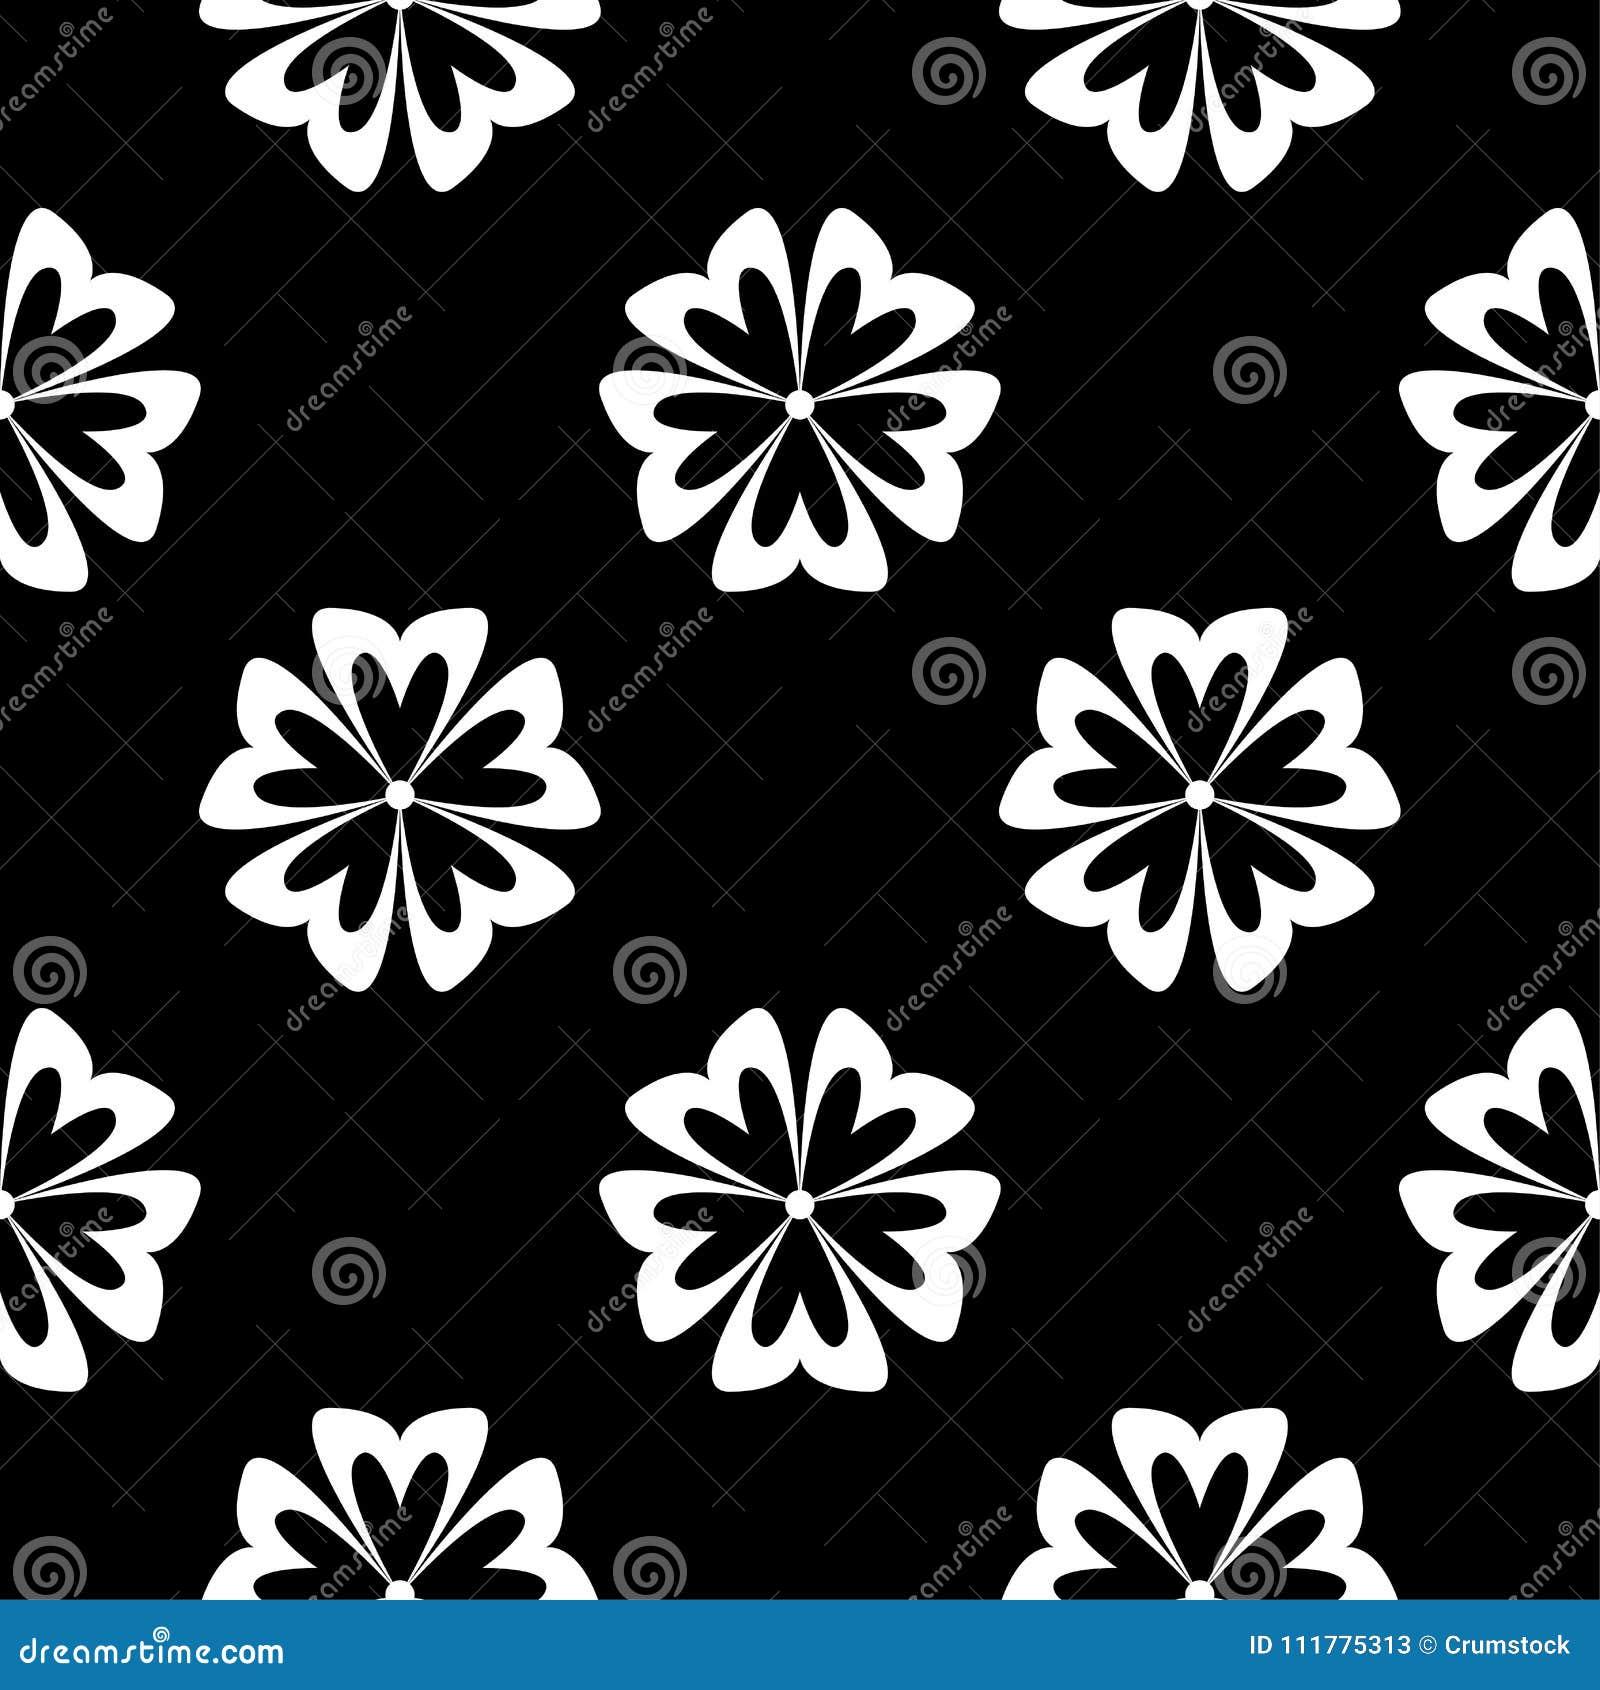 White flowers on black background. Ornamental seamless pattern